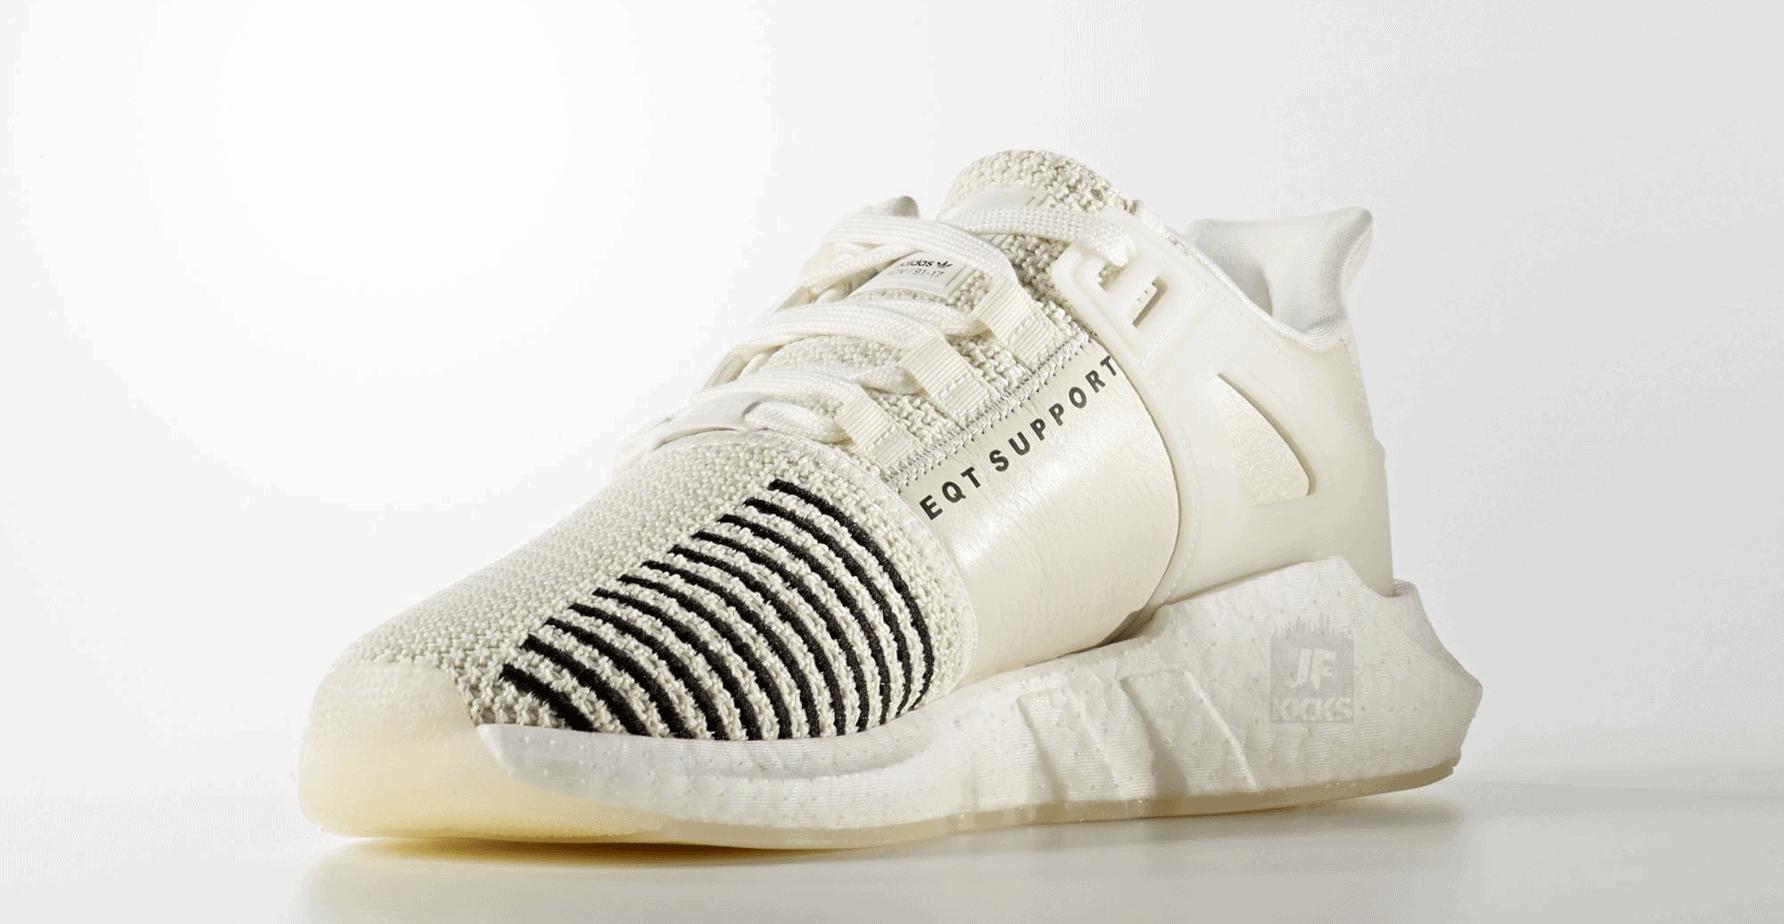 adidas EQT Support 93/17 Cream Off White 2017 - JustFreshKicks